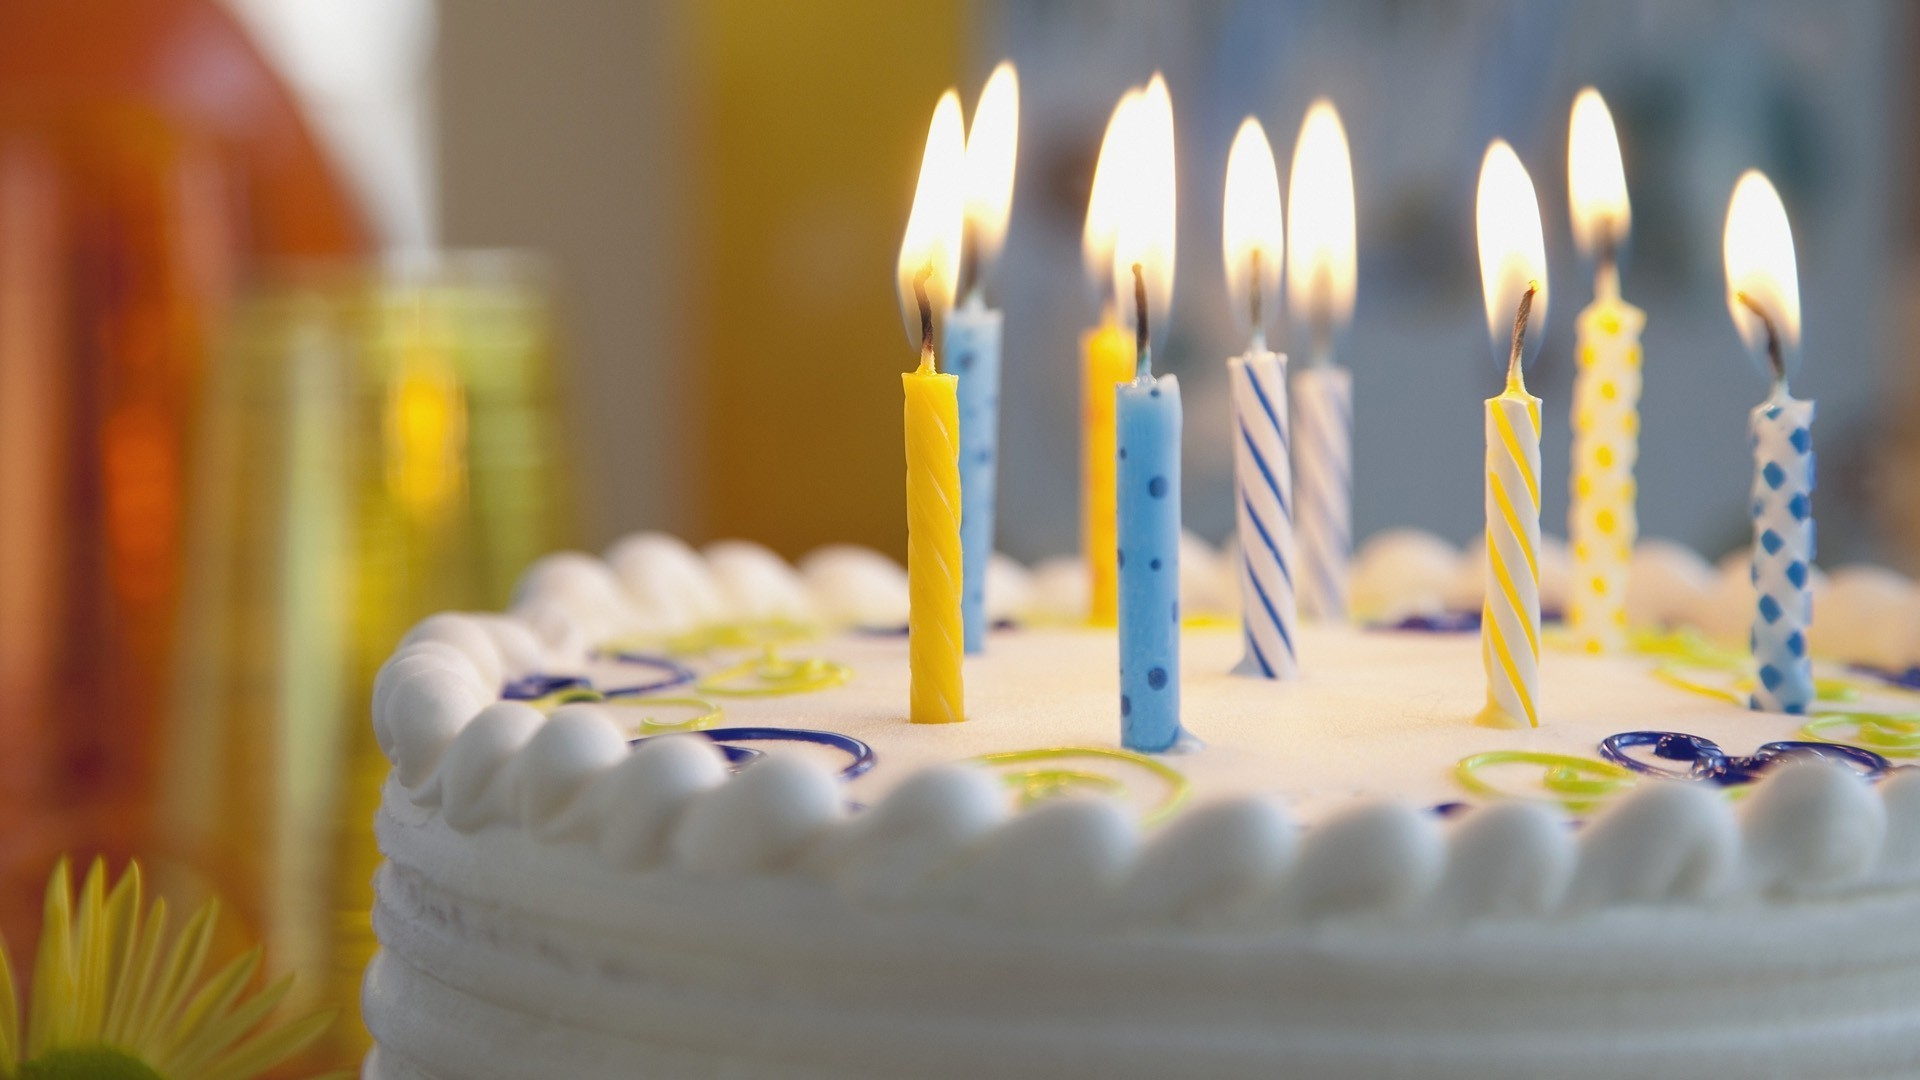 Miraculous Birthday Cake Blank Template Imgflip Funny Birthday Cards Online Inifodamsfinfo